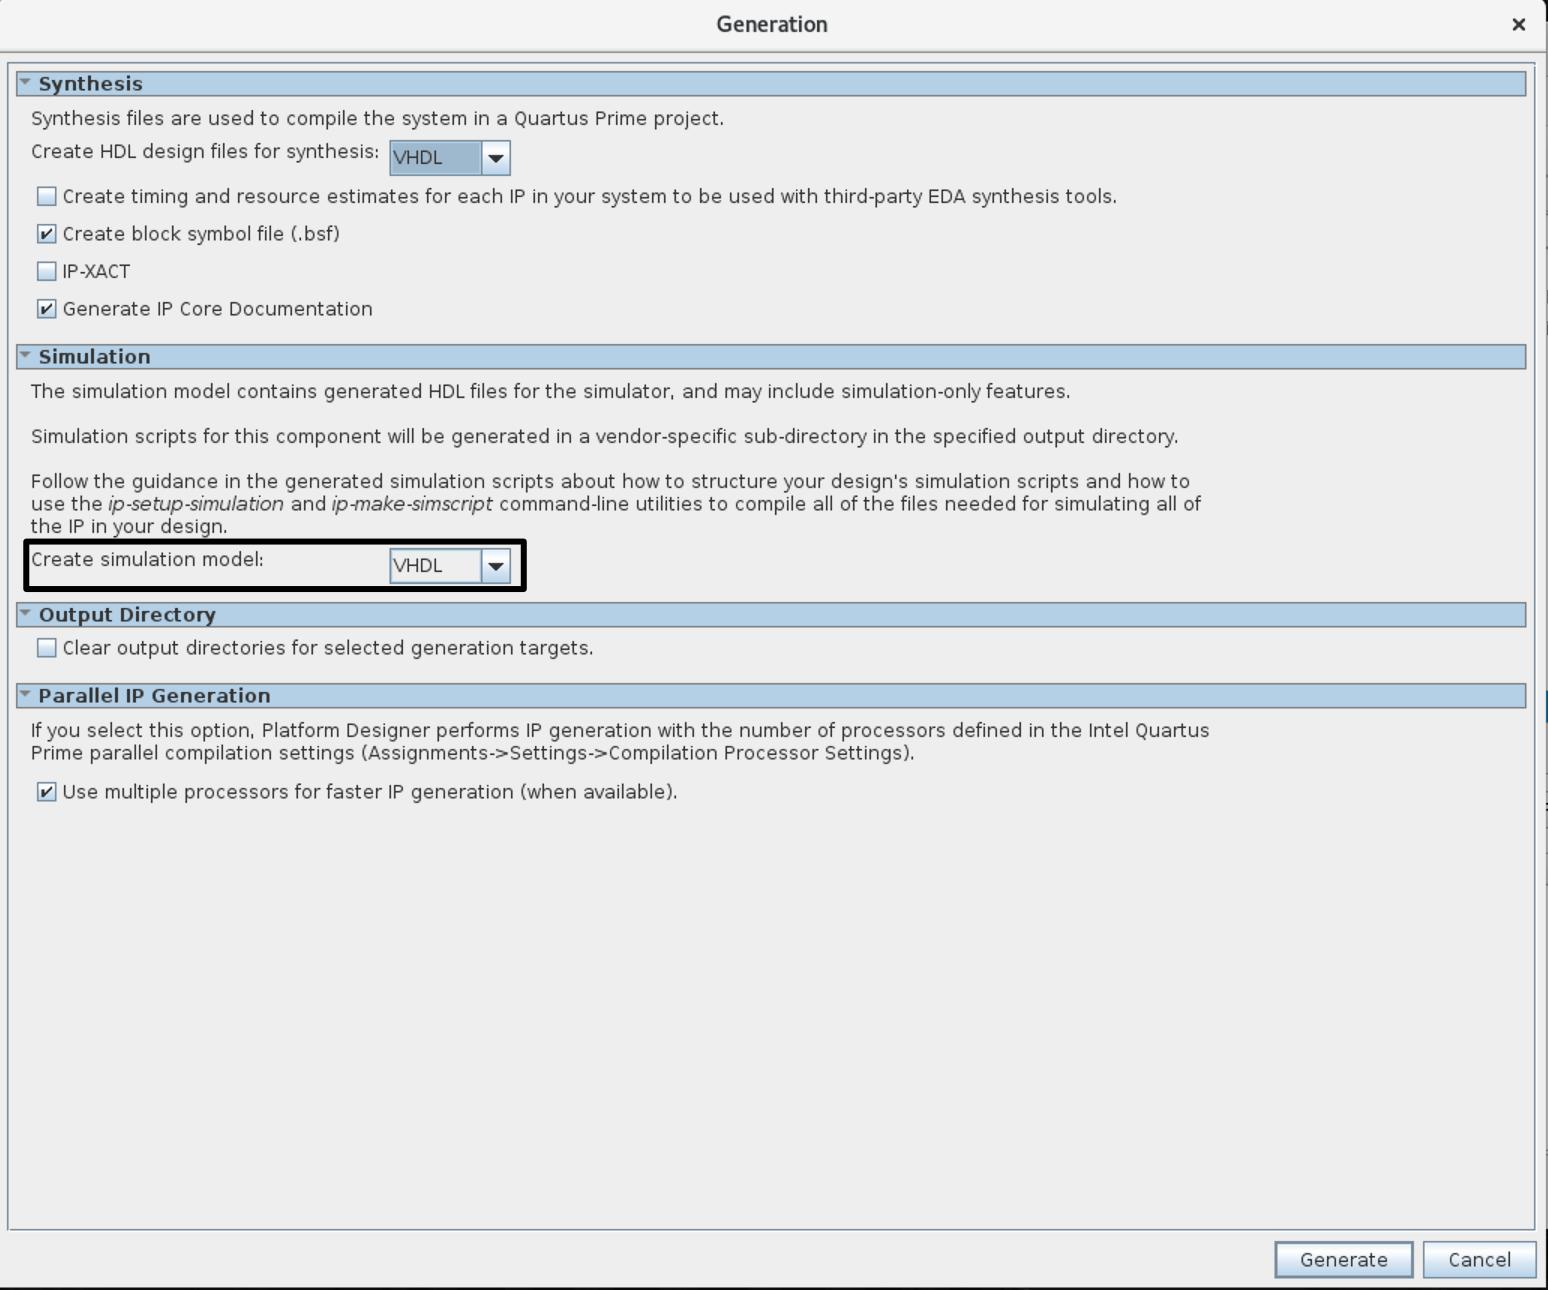 Create simulation mode